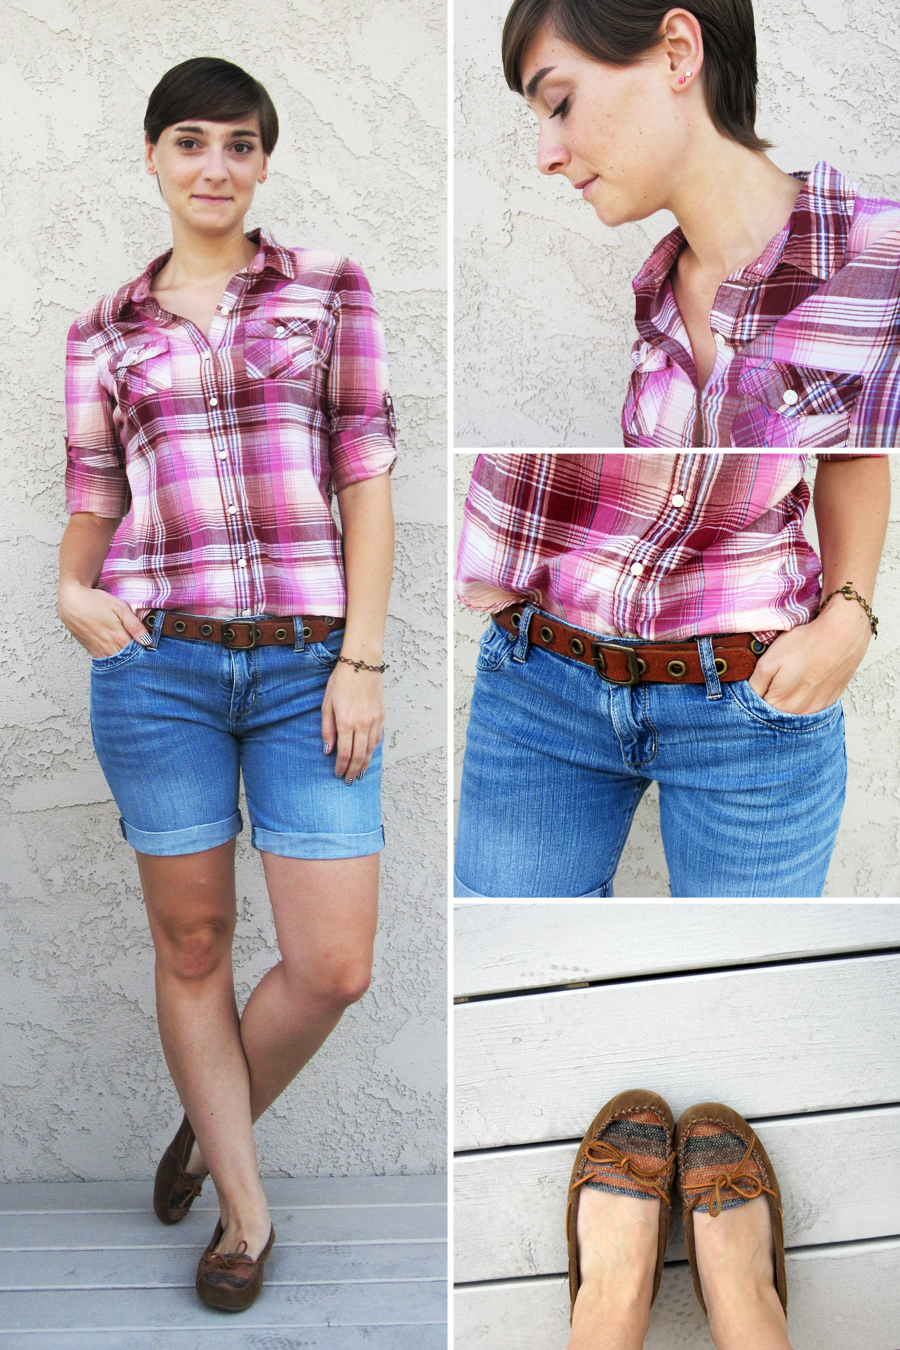 ootd - plaid shirt, shorts, moccasins 2